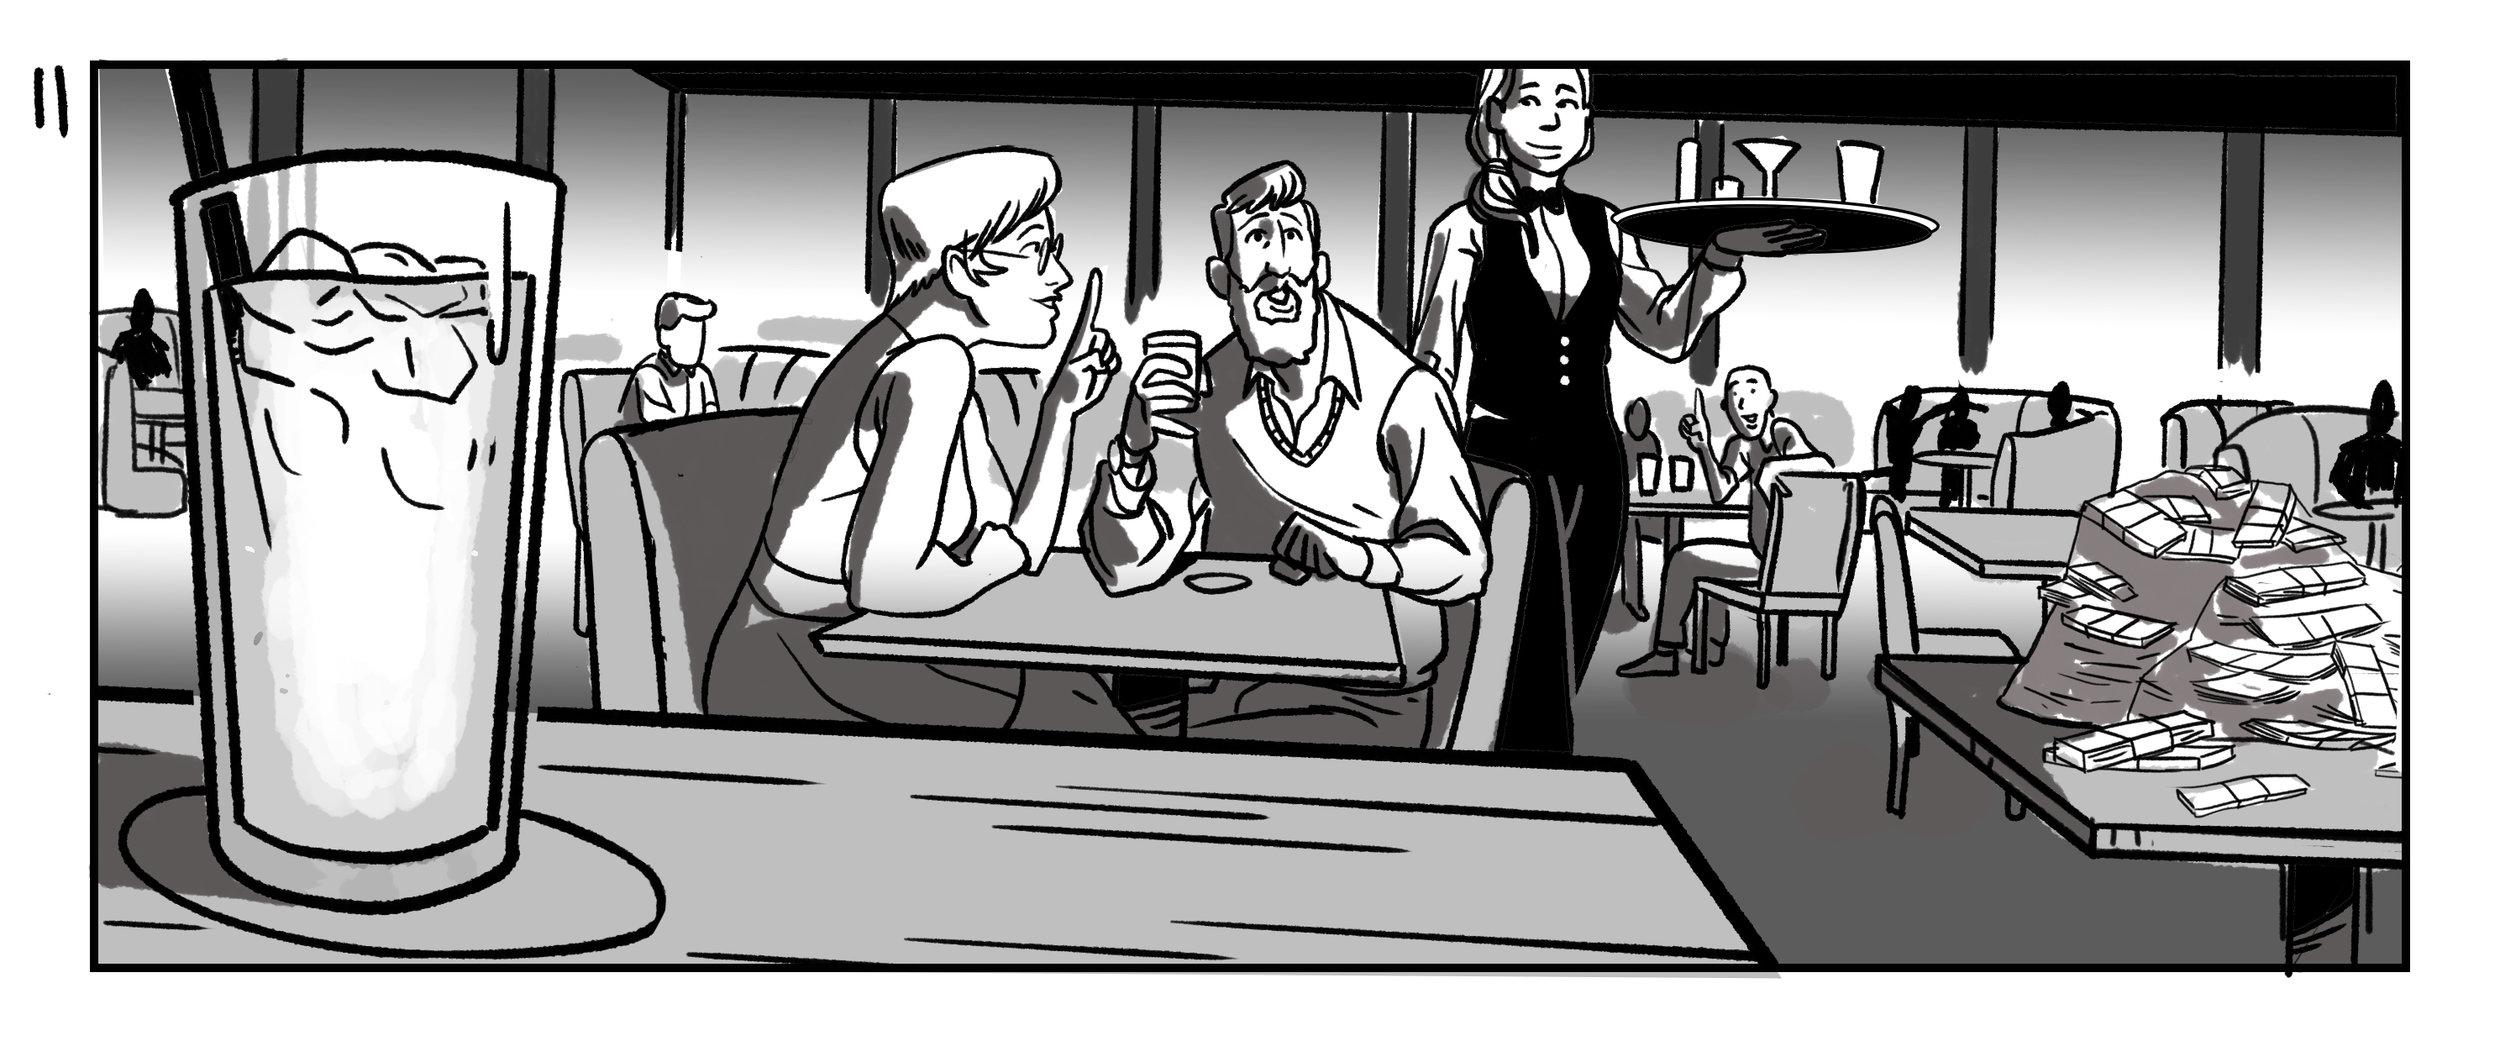 FF_StoryboardTest_B&W_Panel_11.jpg